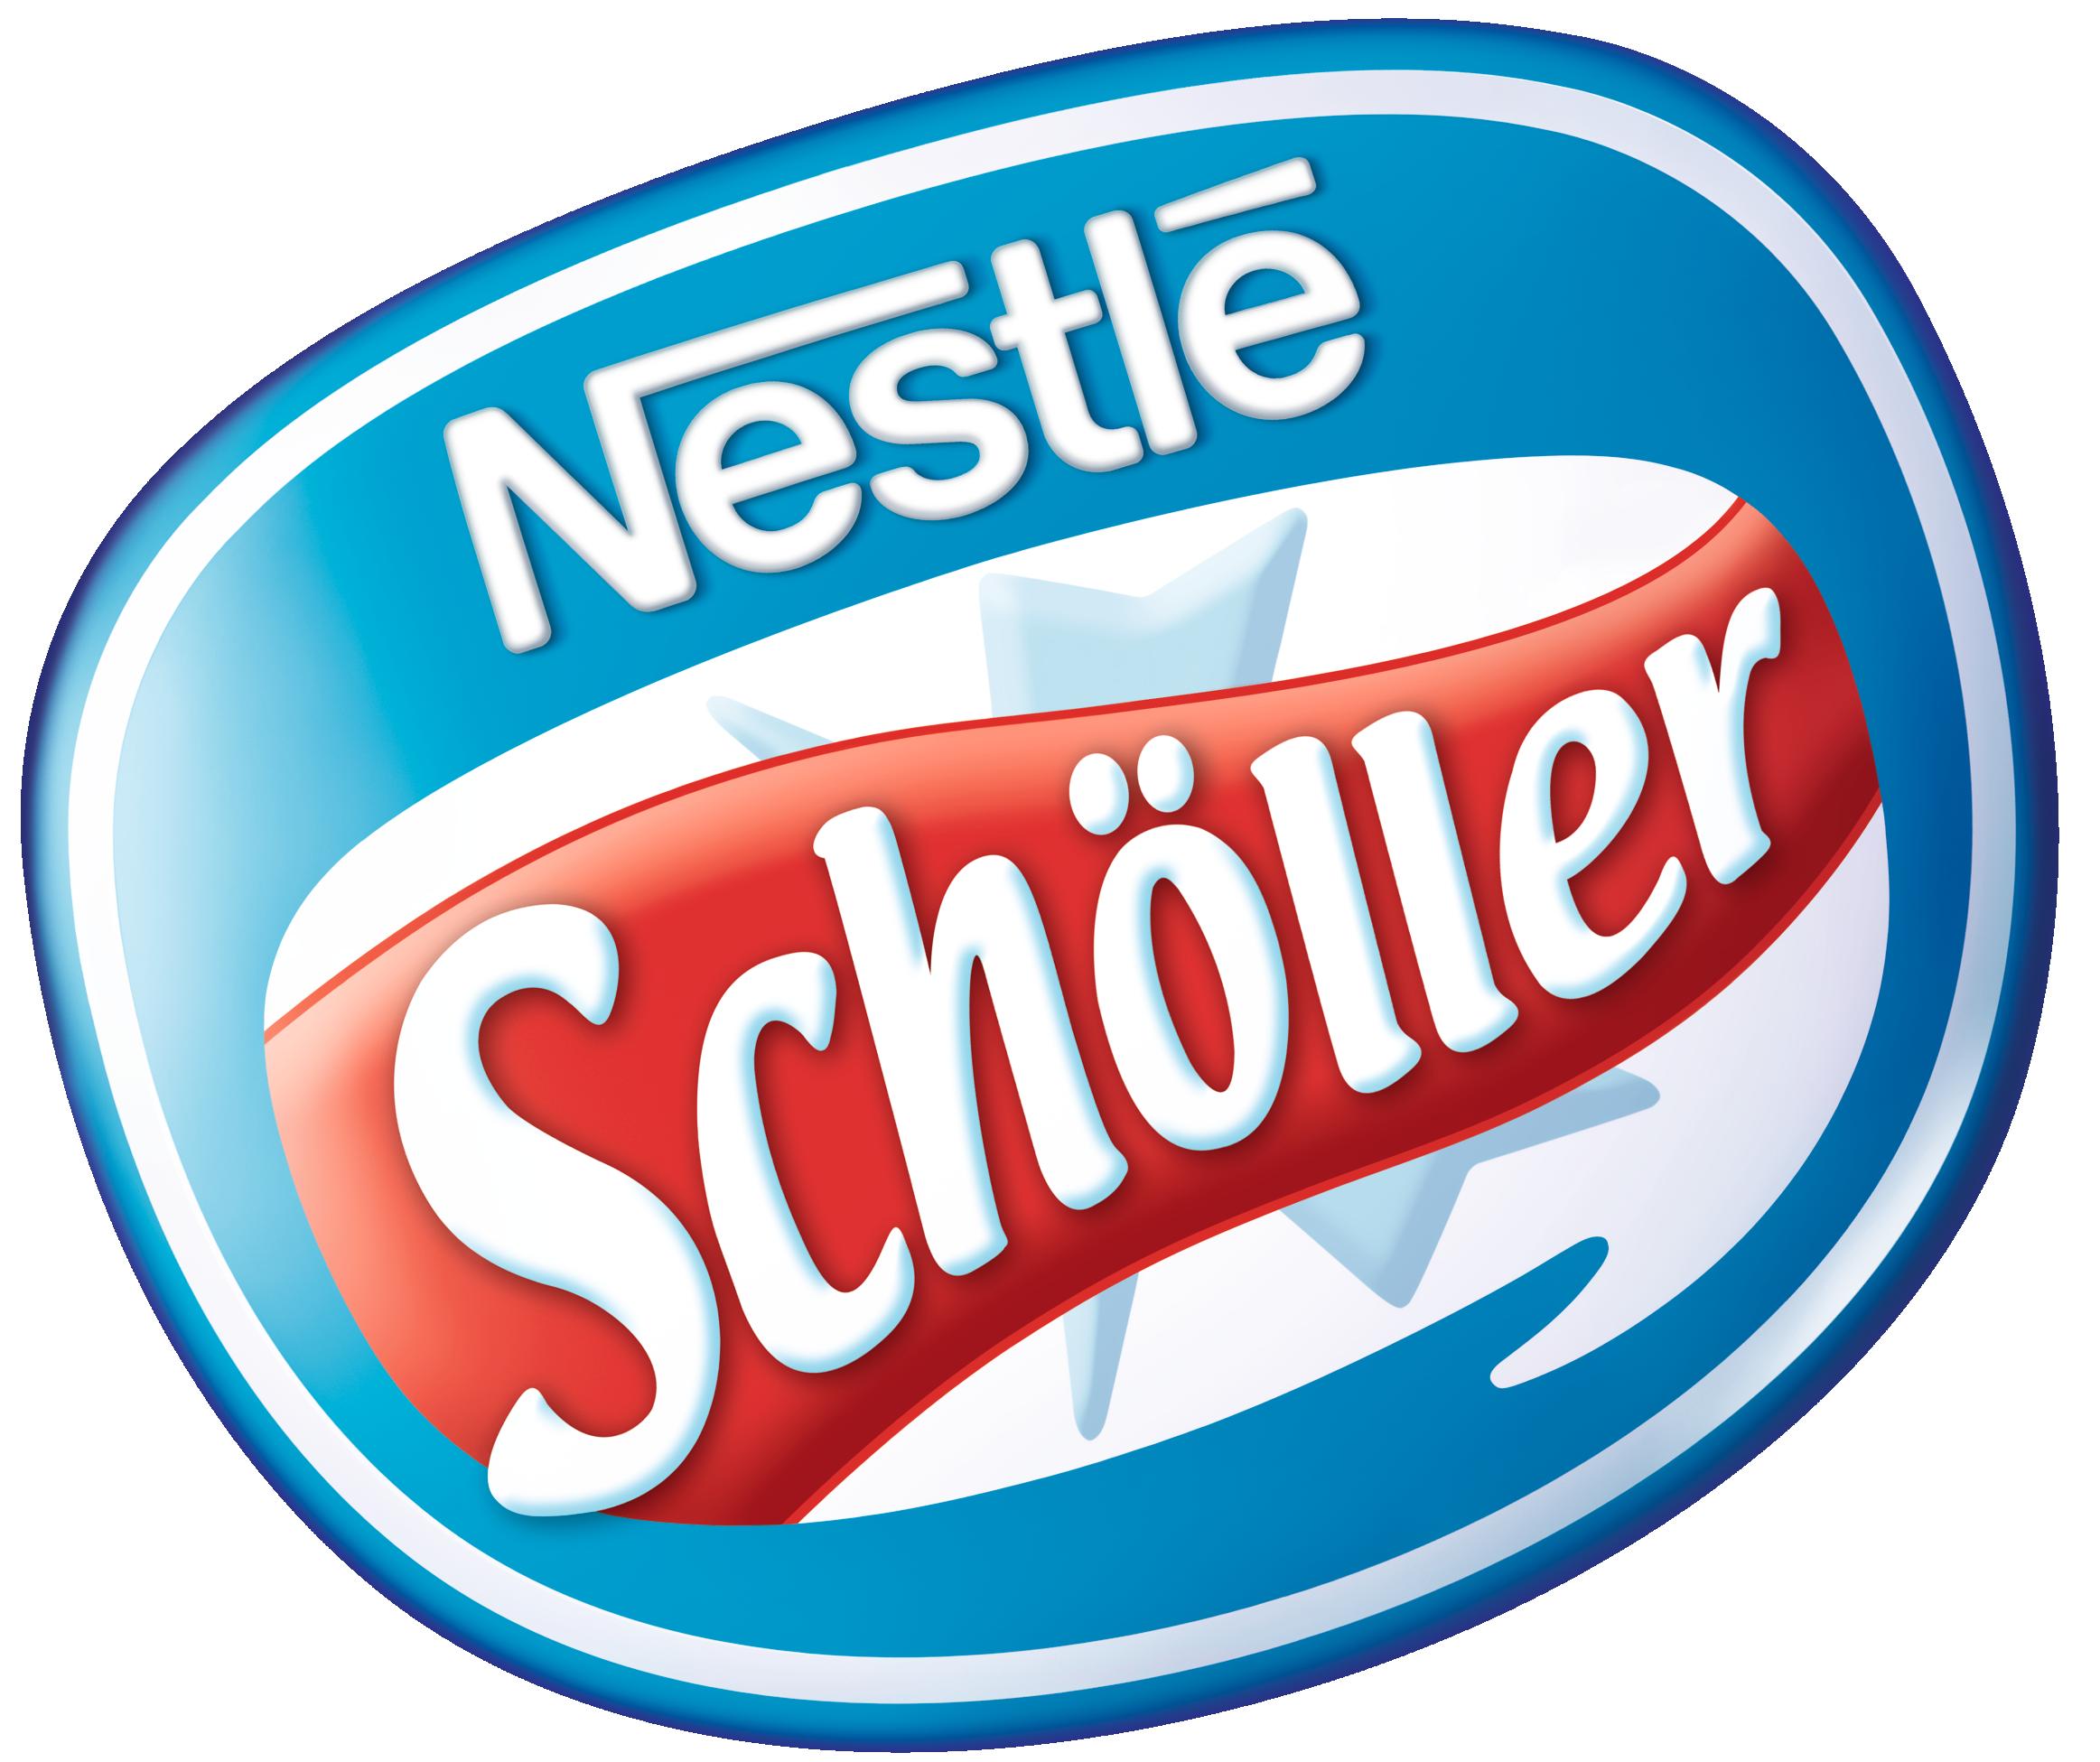 Nestle Scholler 2016